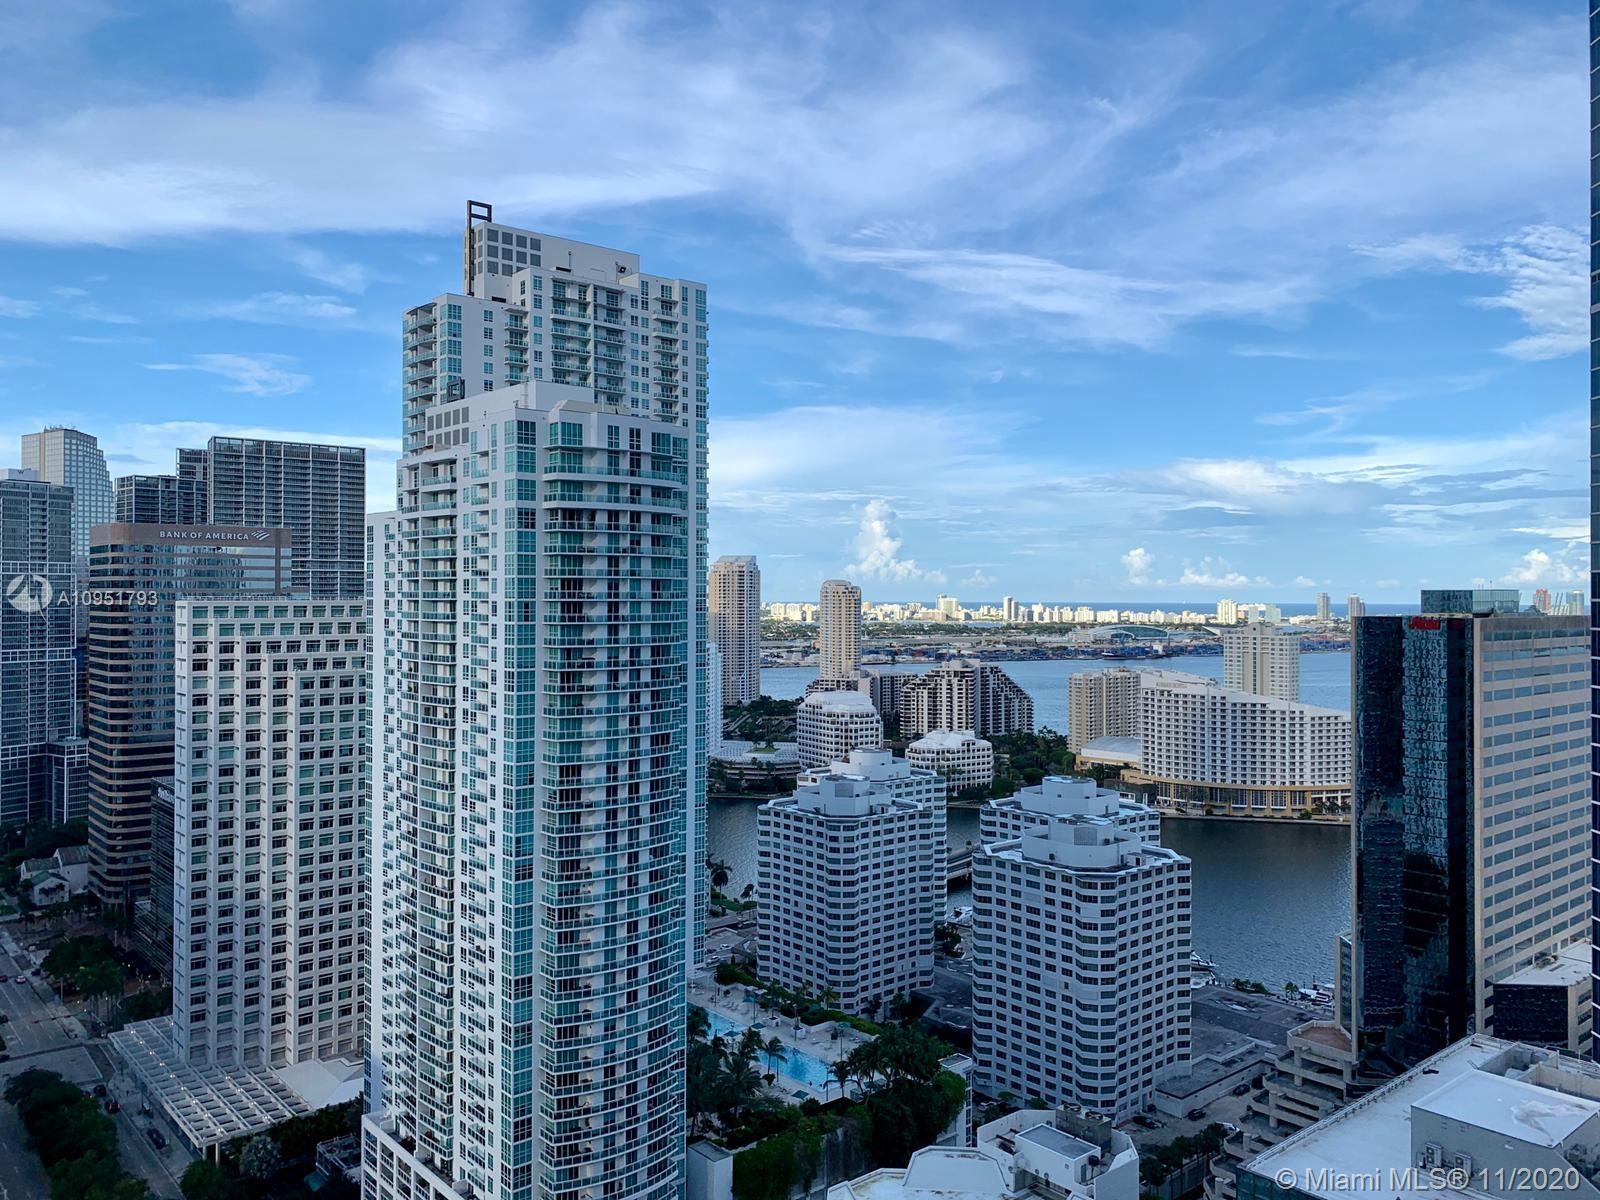 1060 Brickell West Tower #3617 - 1060 Brickell Ave #3617, Miami, FL 33131